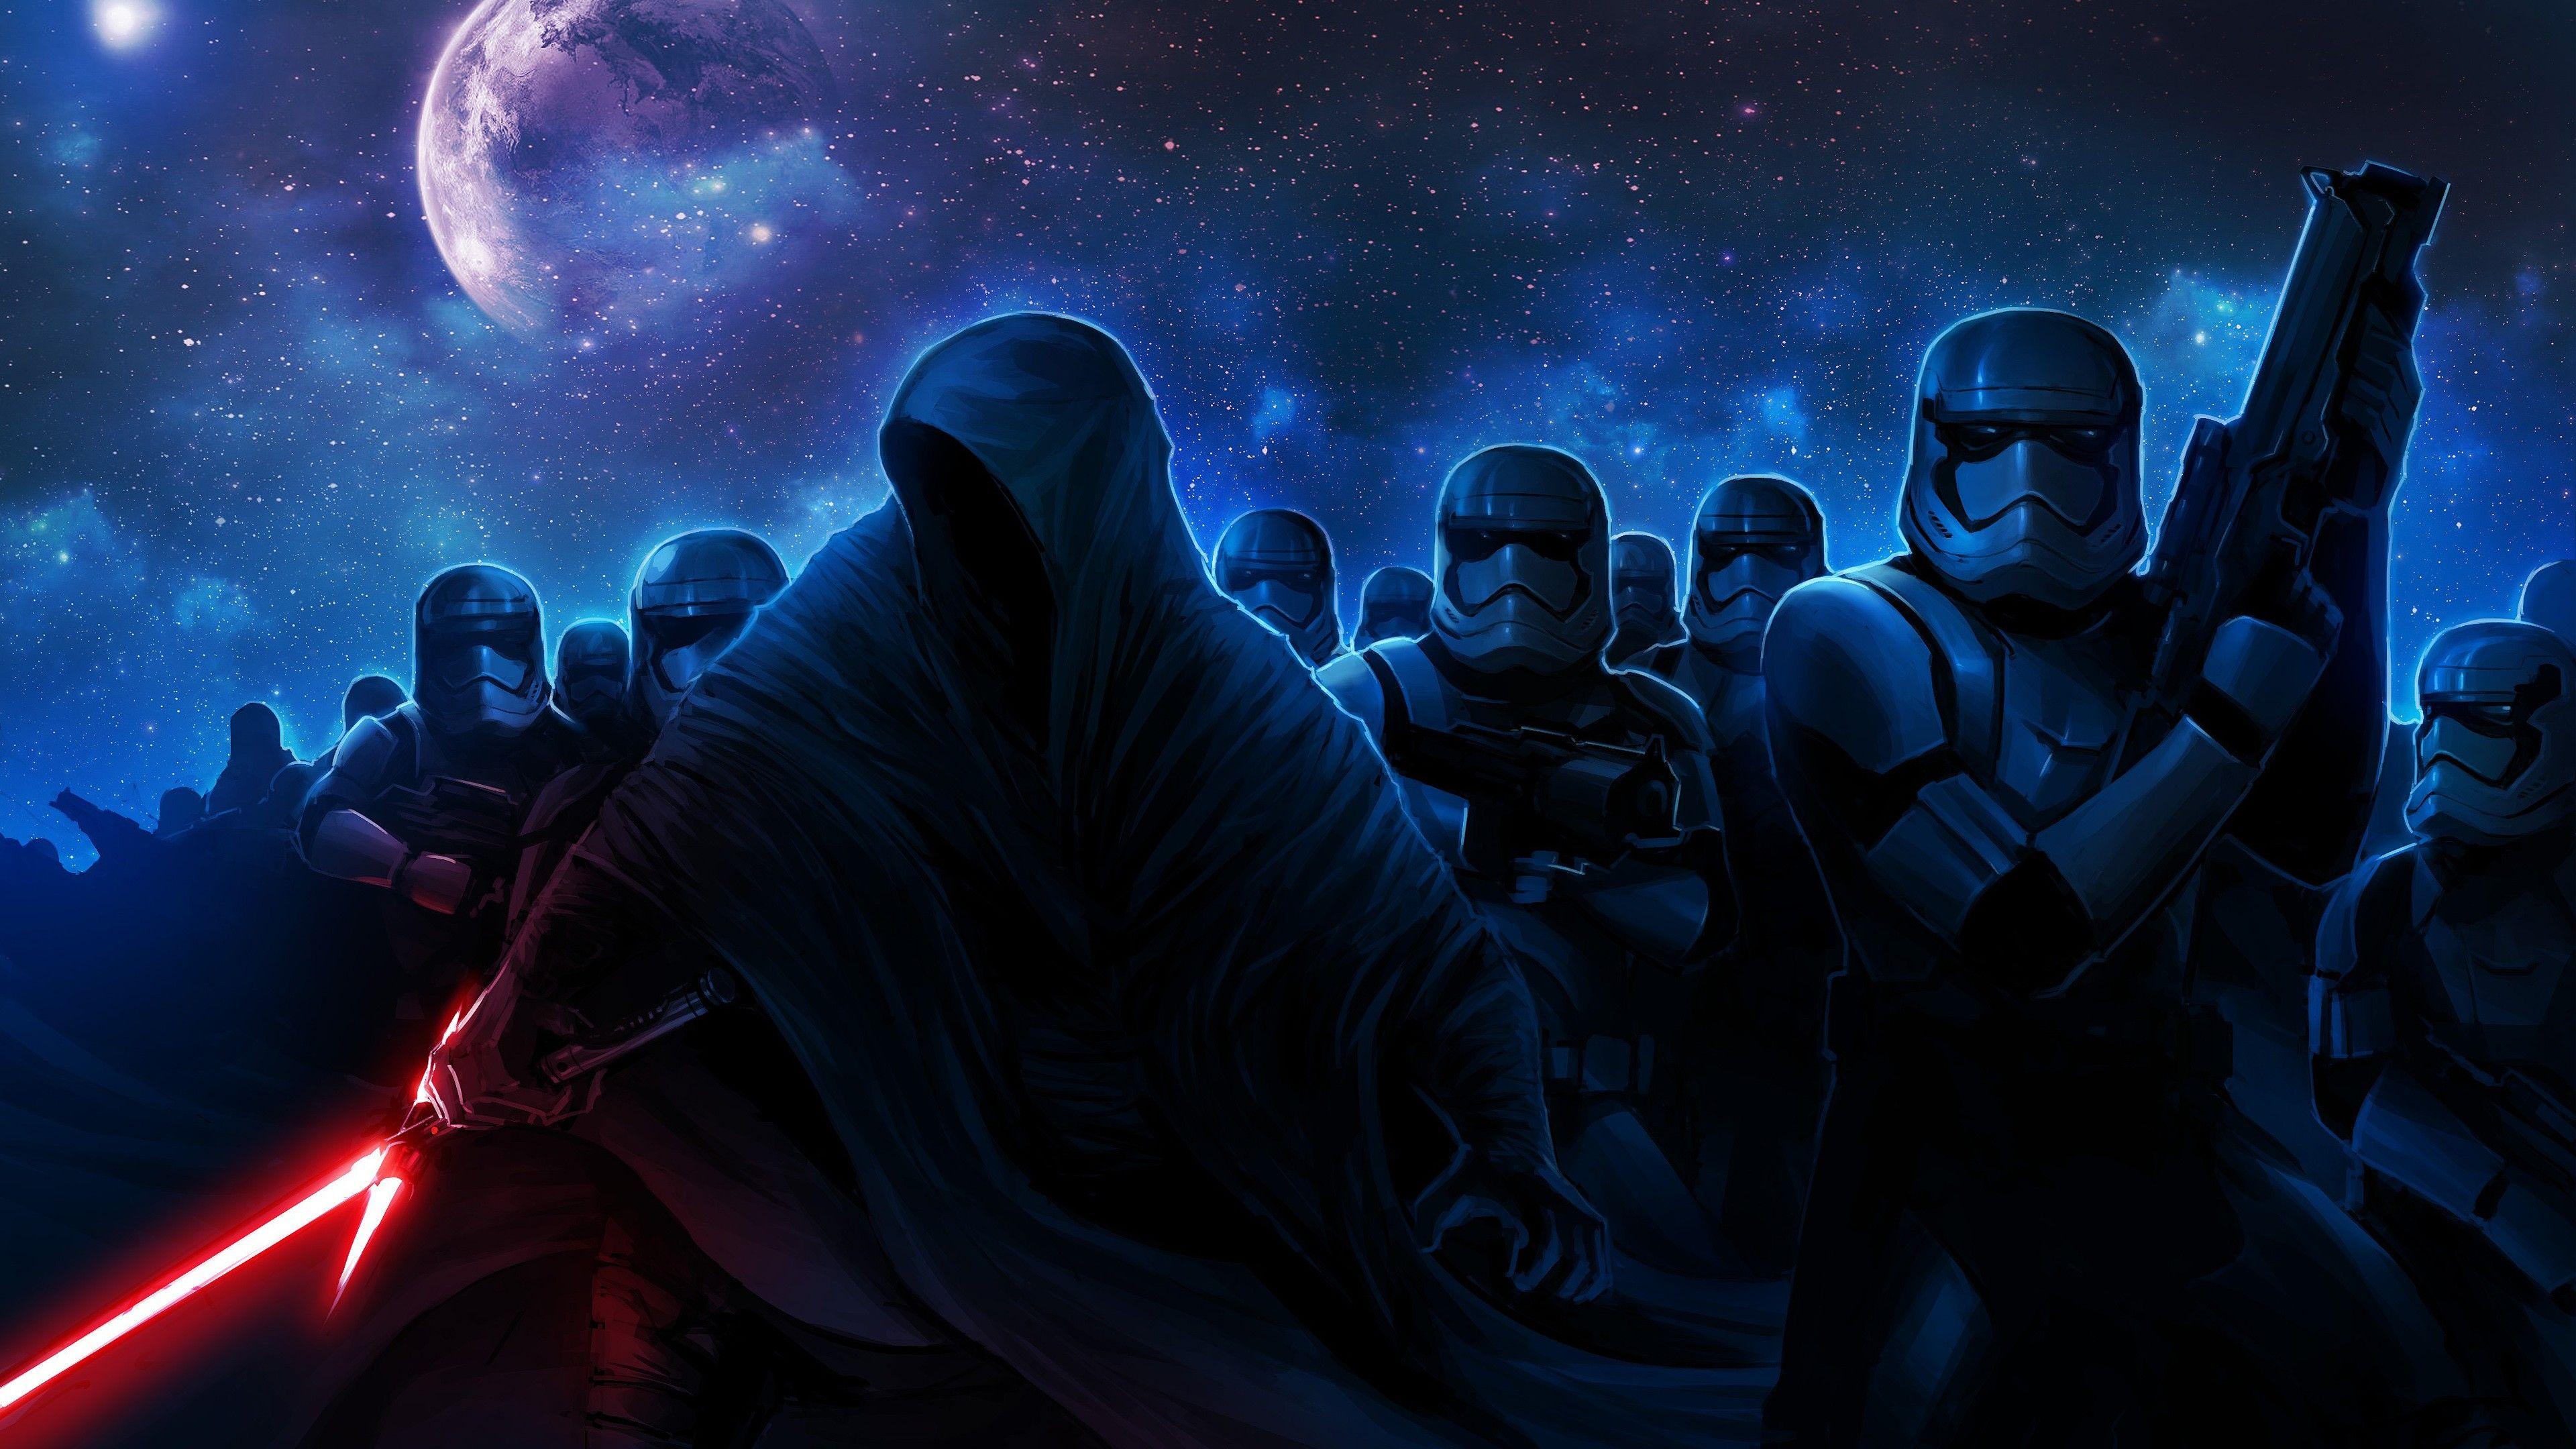 Stormtroopers Darth Vader Games Wallpapers Darth Vader Wallpapers